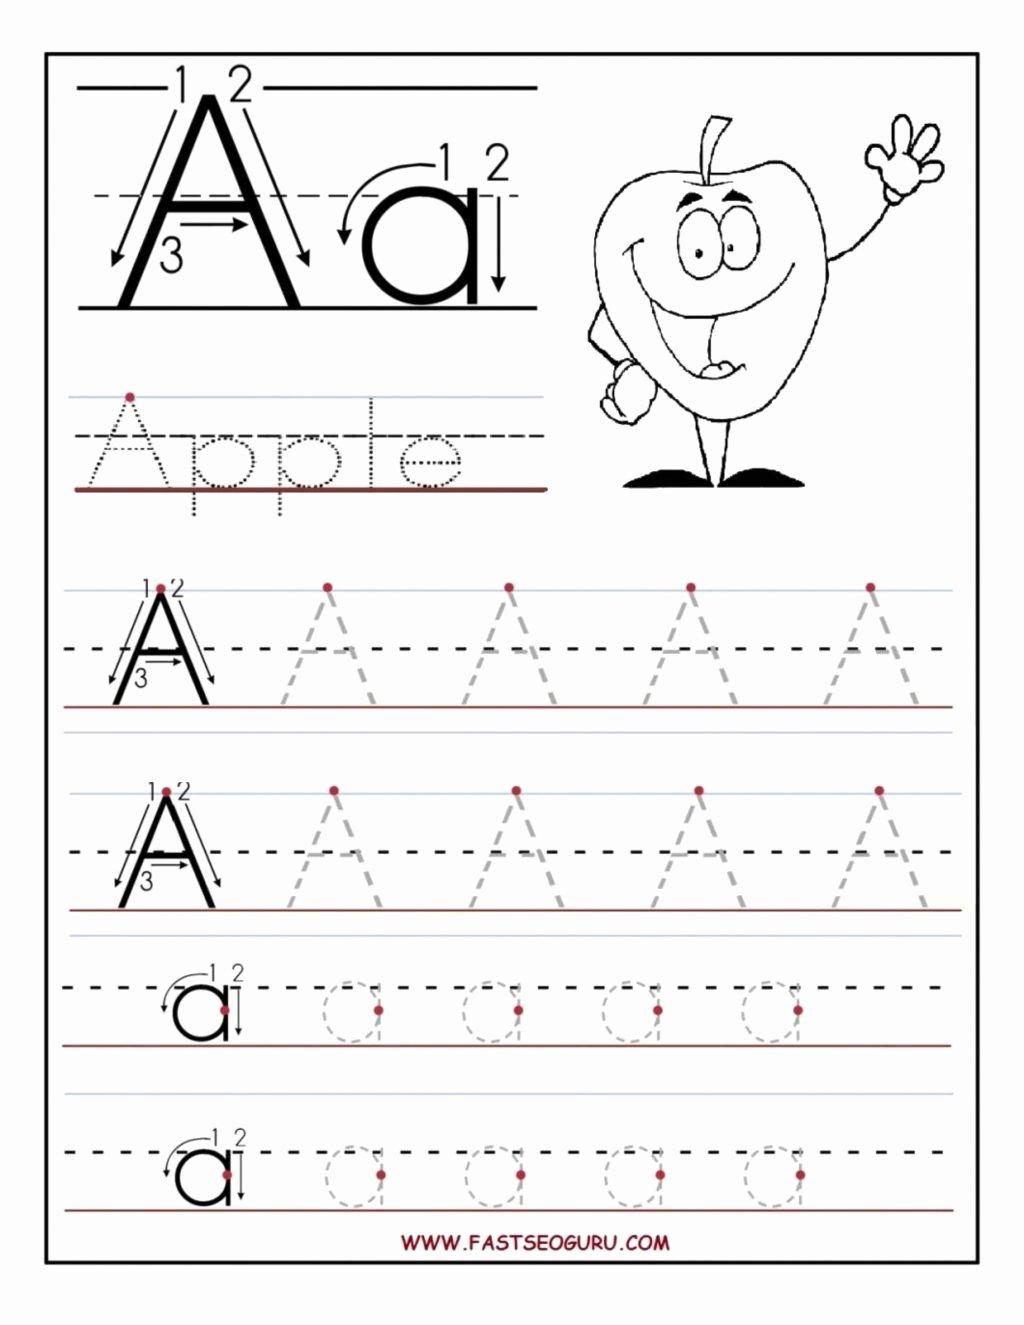 Printable Letter A Worksheets for Preschoolers Best Of Worksheet Worksheet Printable Alphabetng Free Kids Best